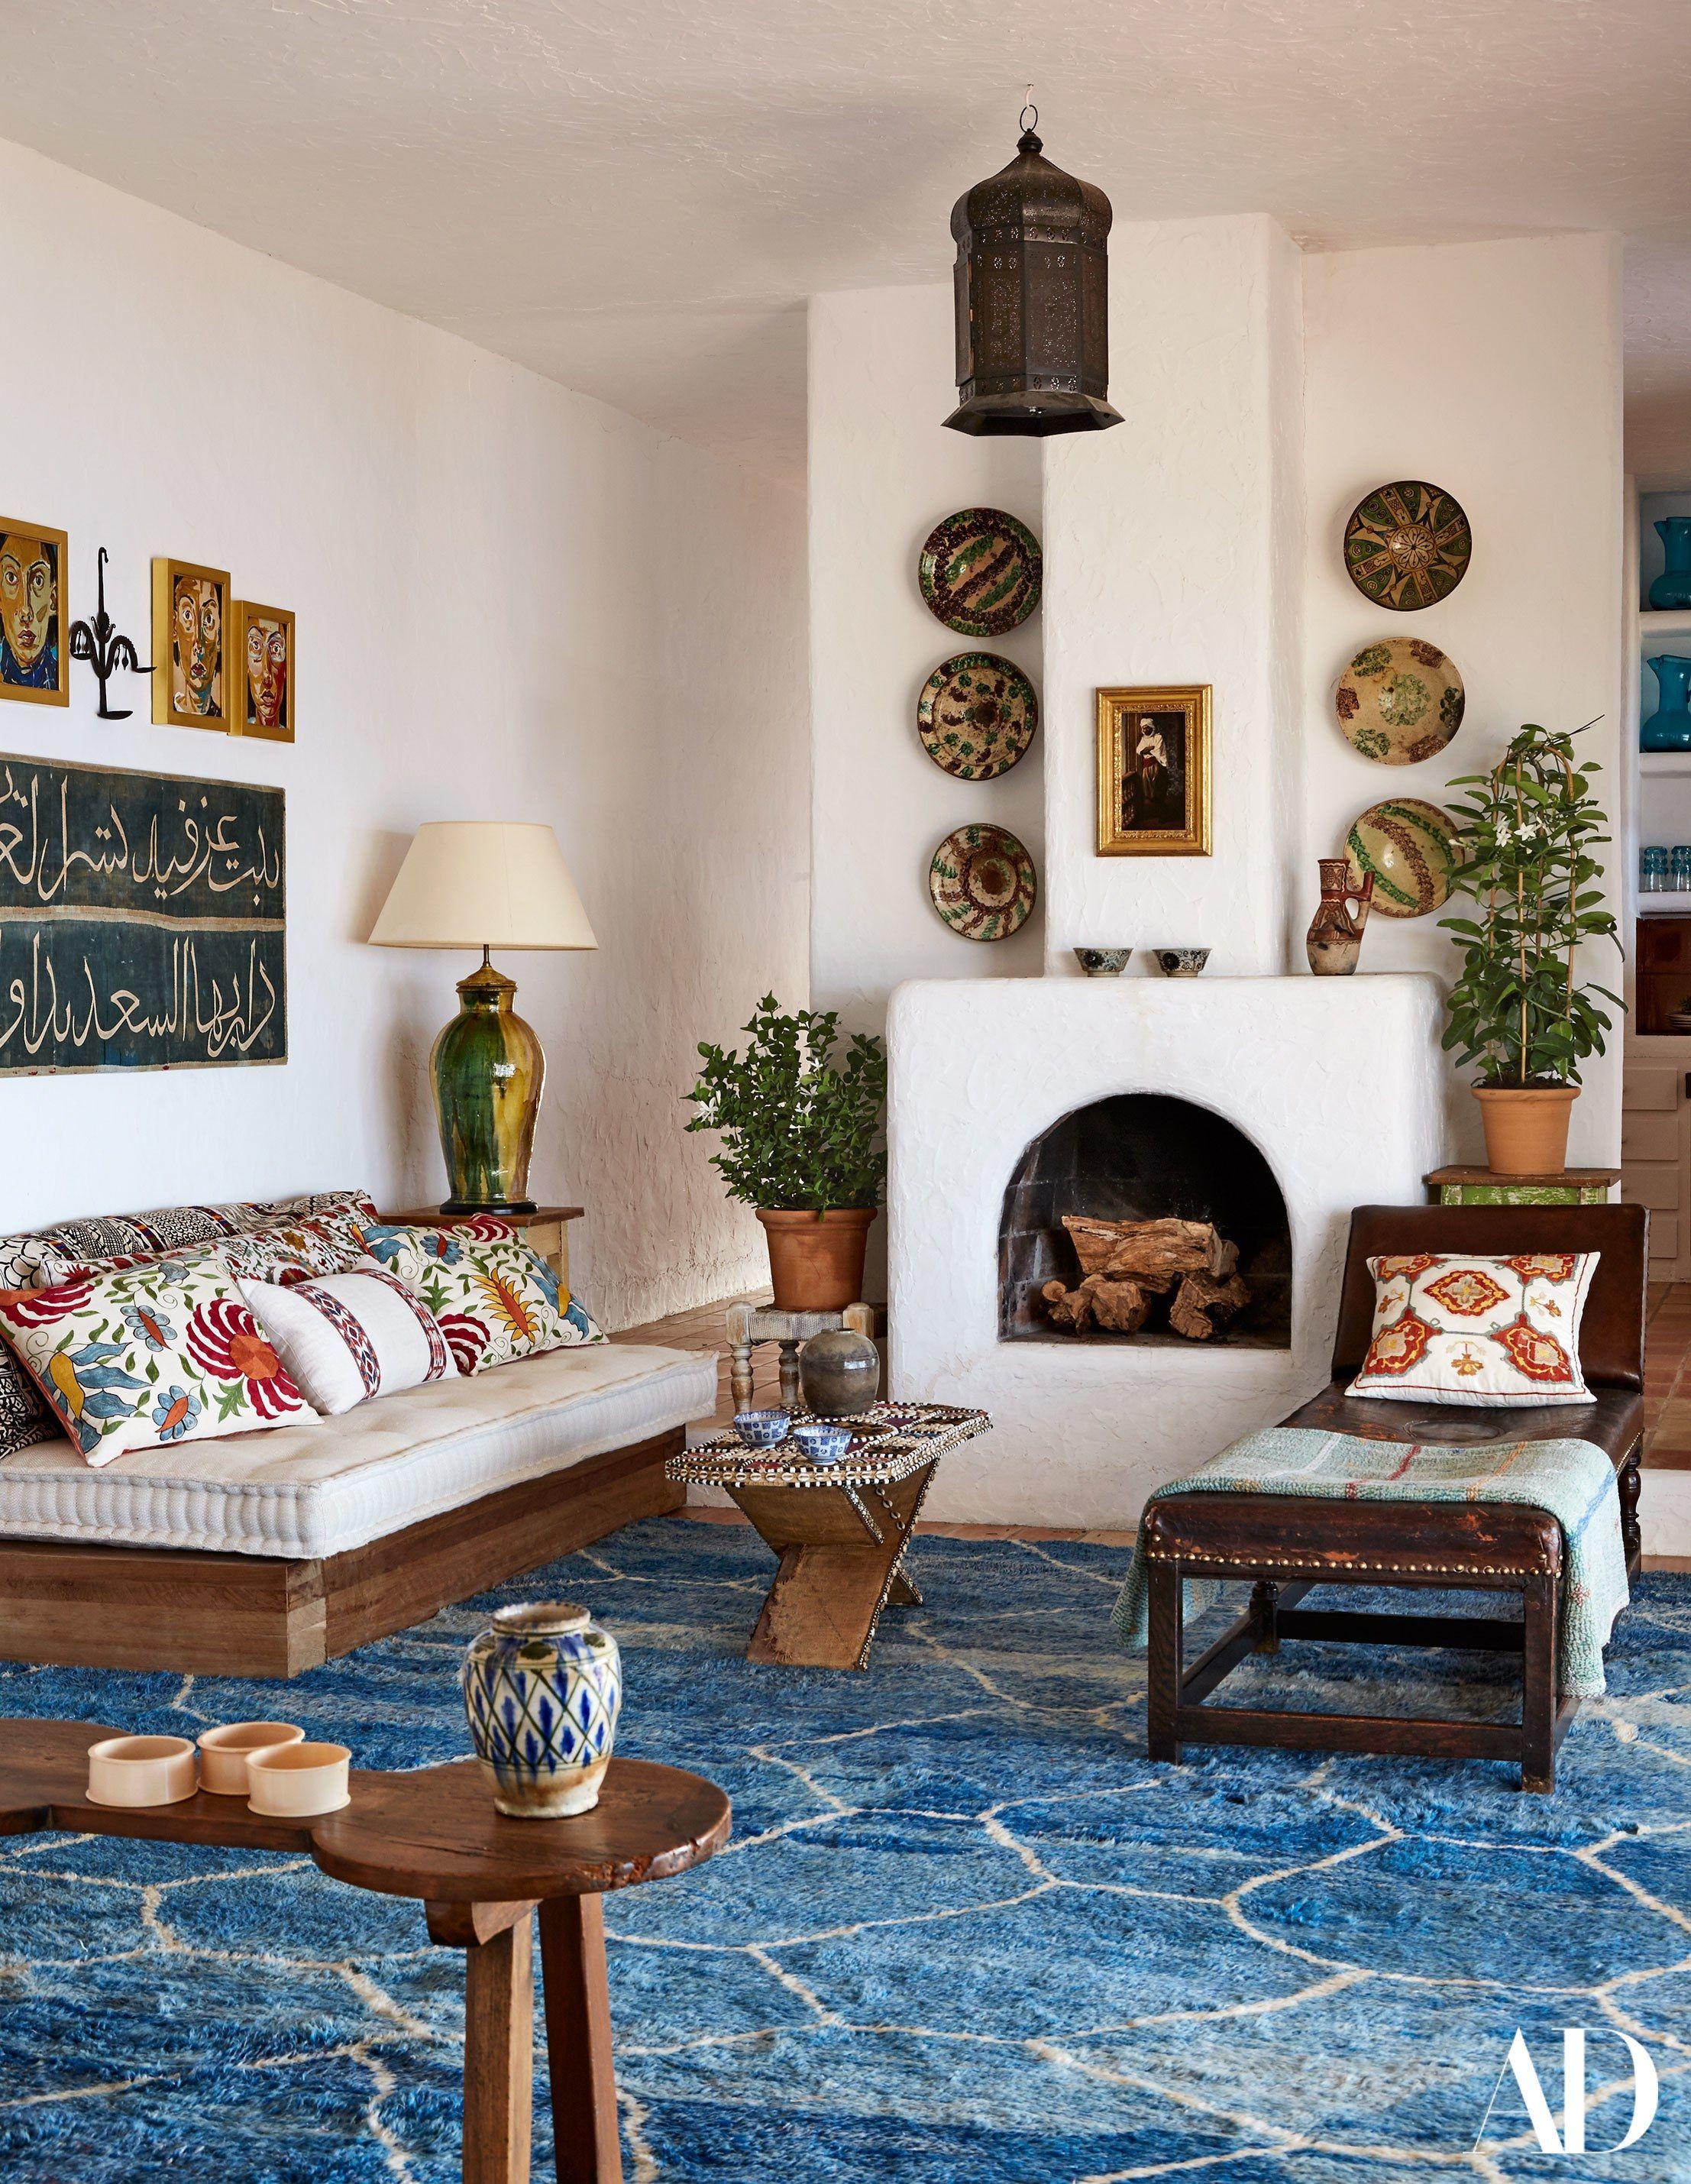 Escape To Daniel Romualdez S Oasis In Ibiza Architectural Digest  # Muebles Nomad Ibiza